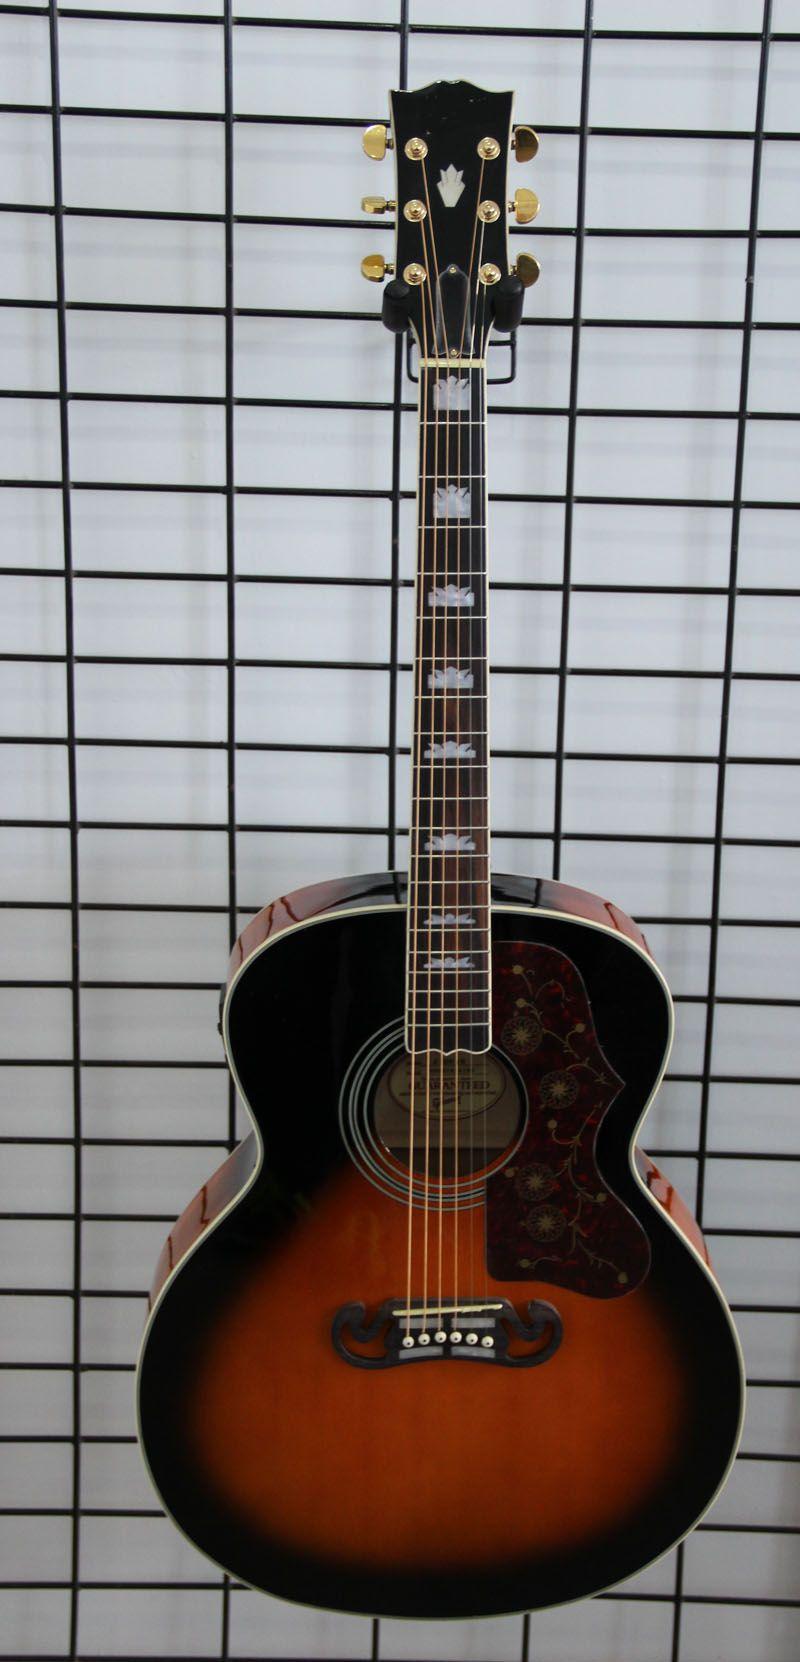 wholesale most popular music instrument 43 39 39 jumbo 6 string j200 acoustic electric guitar. Black Bedroom Furniture Sets. Home Design Ideas